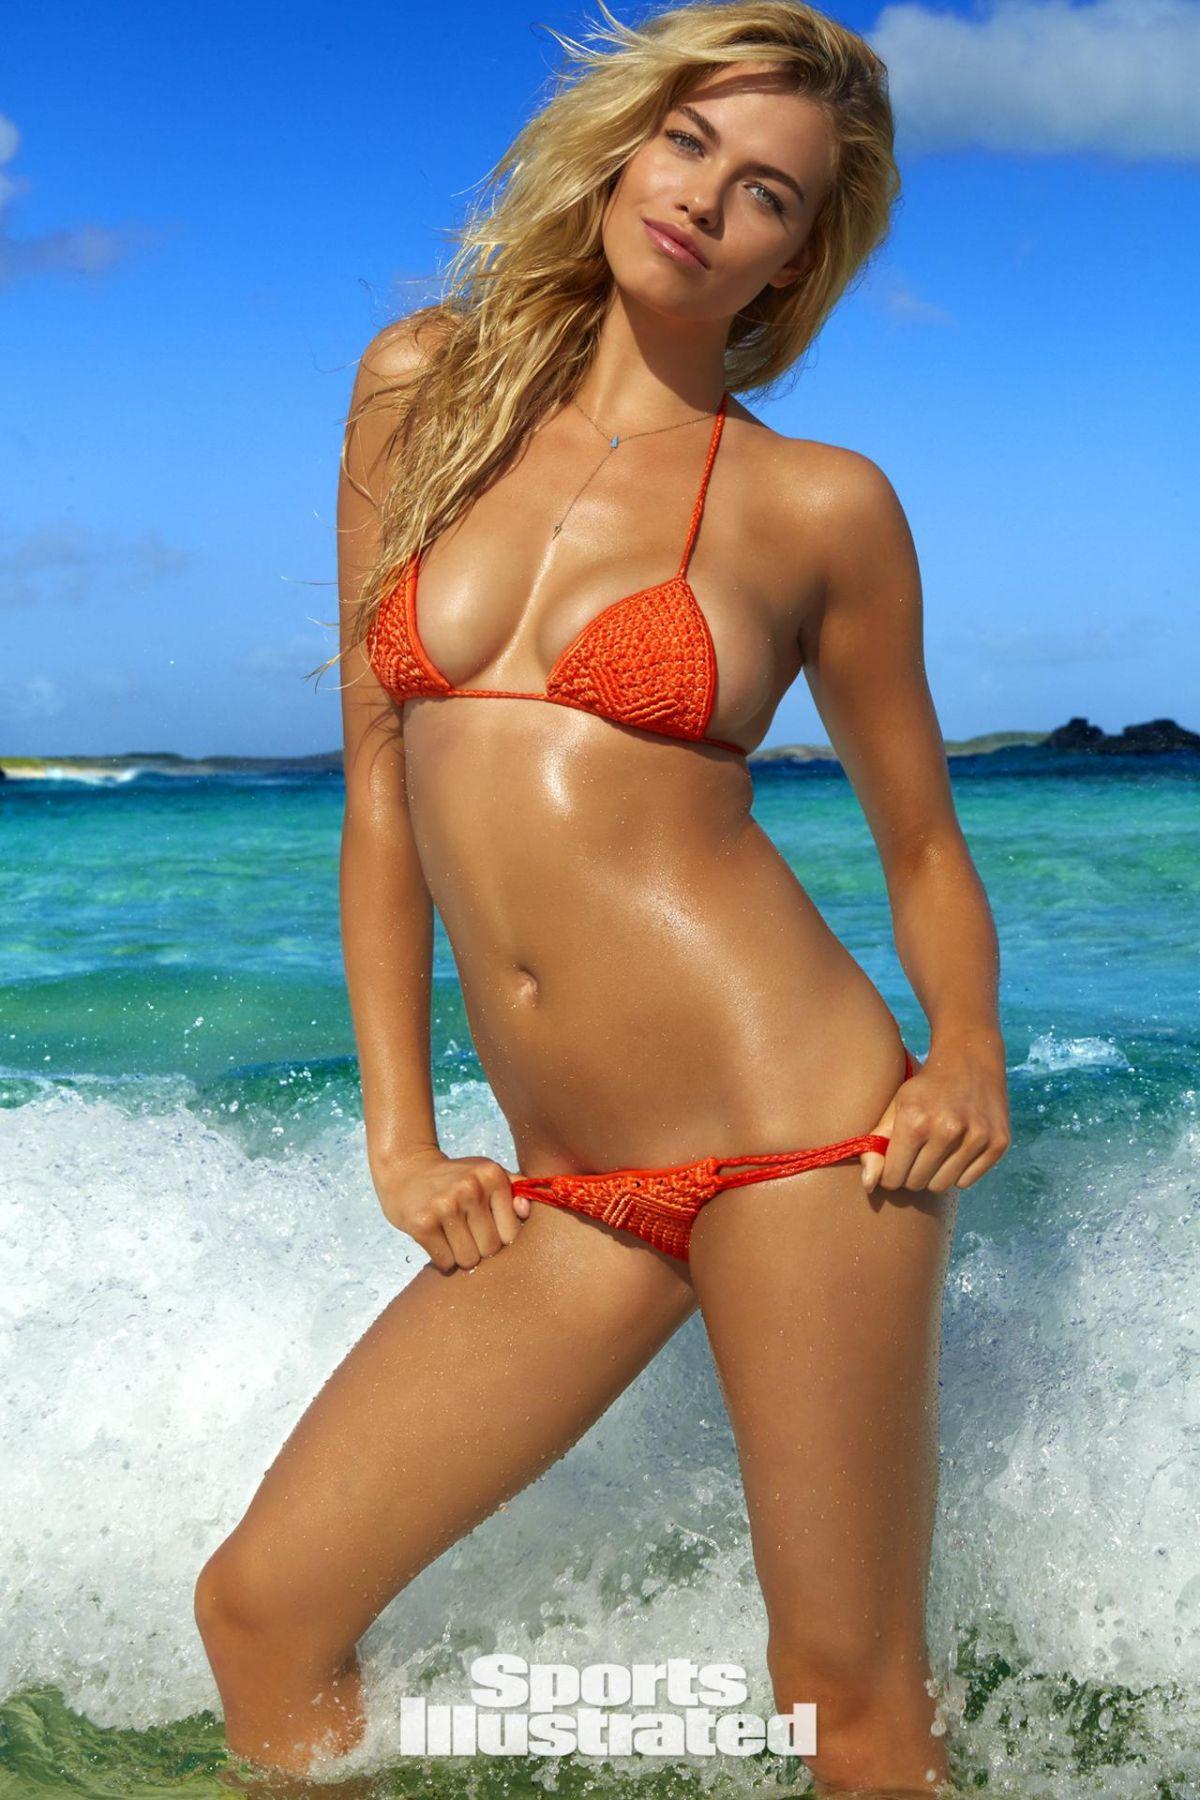 illustrated model sports Bikini